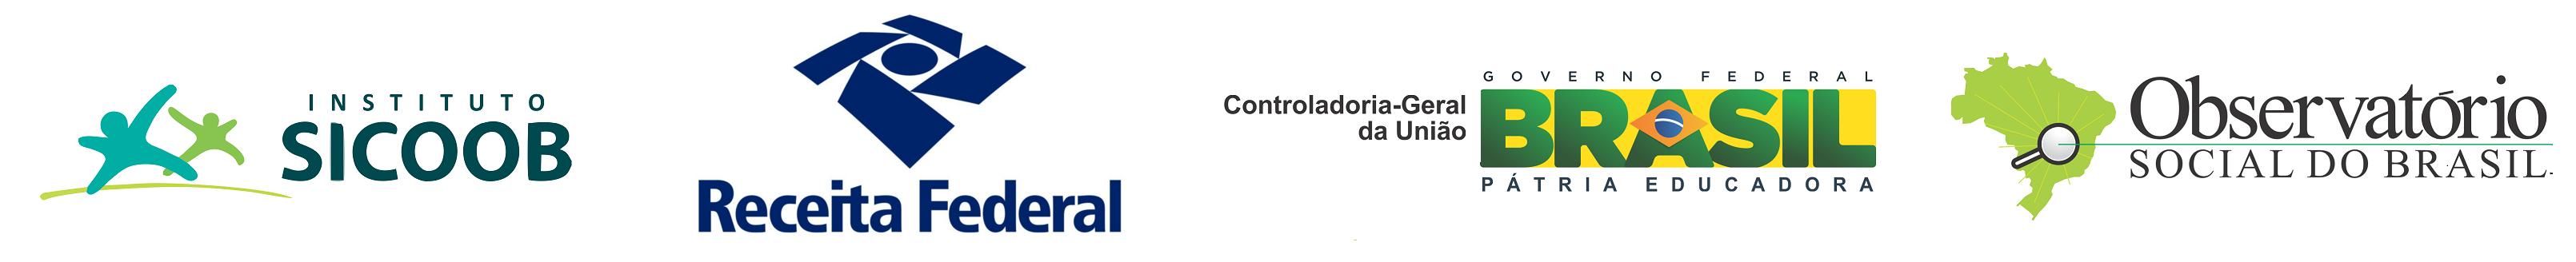 patrocínio 7 º CDR